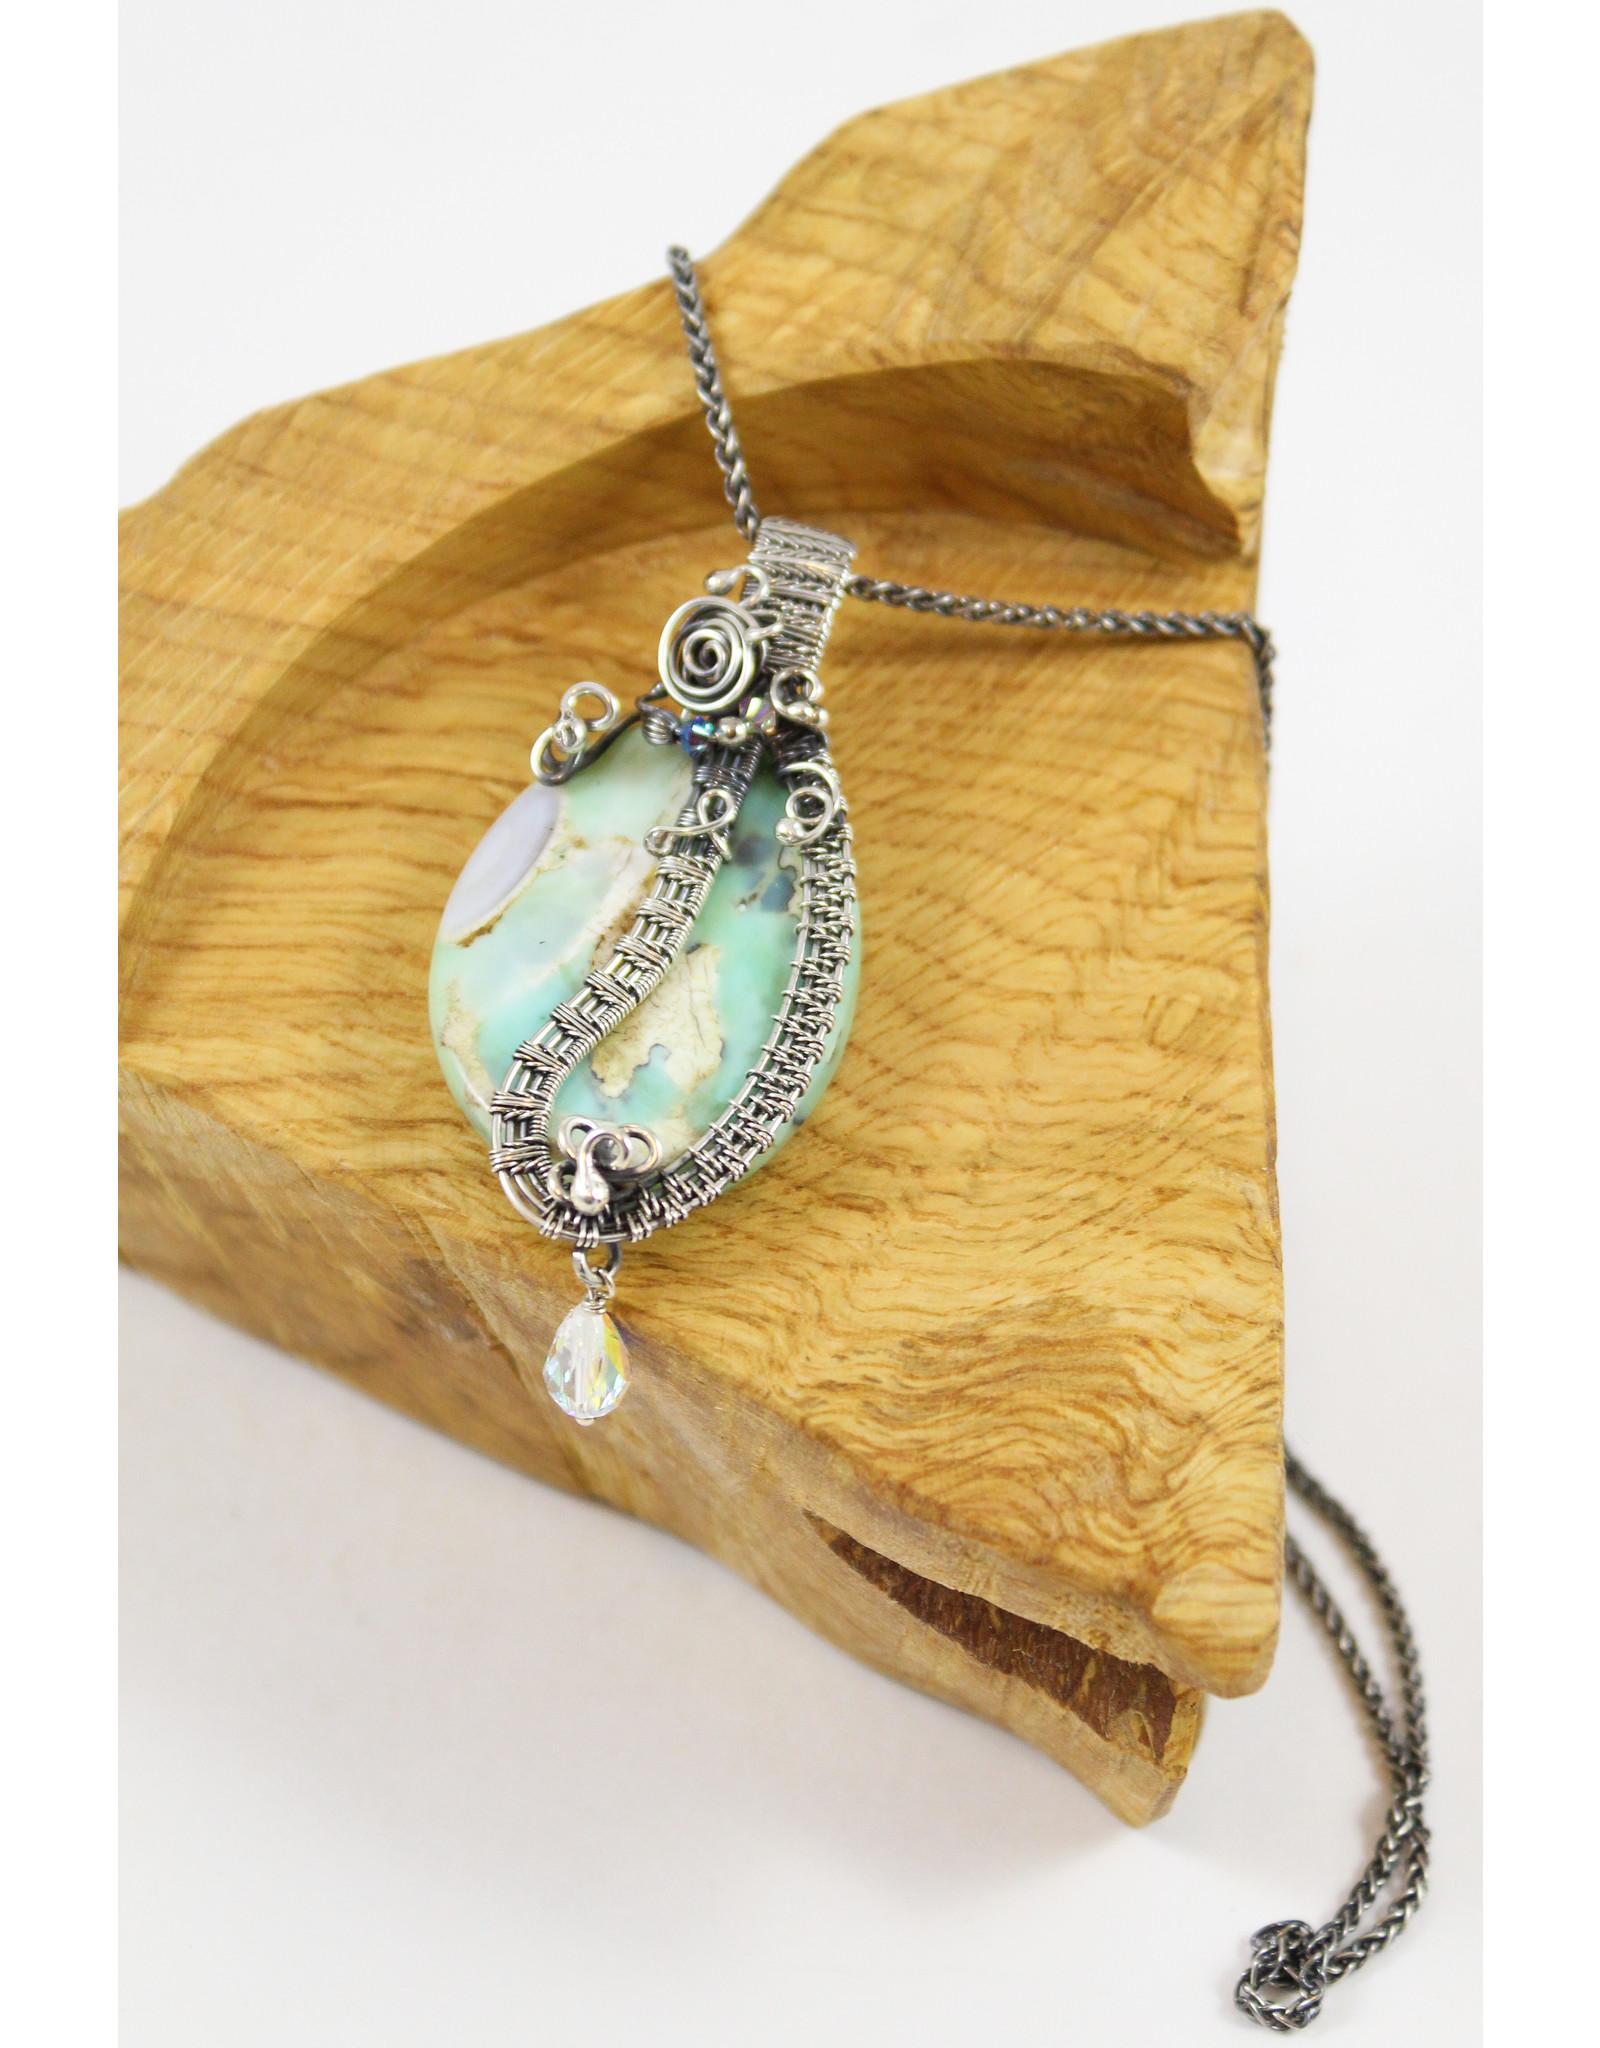 Tasha Matthews Complex Wire Weave Pendants with Semi-Precious Stones by Tasha Grace Designs